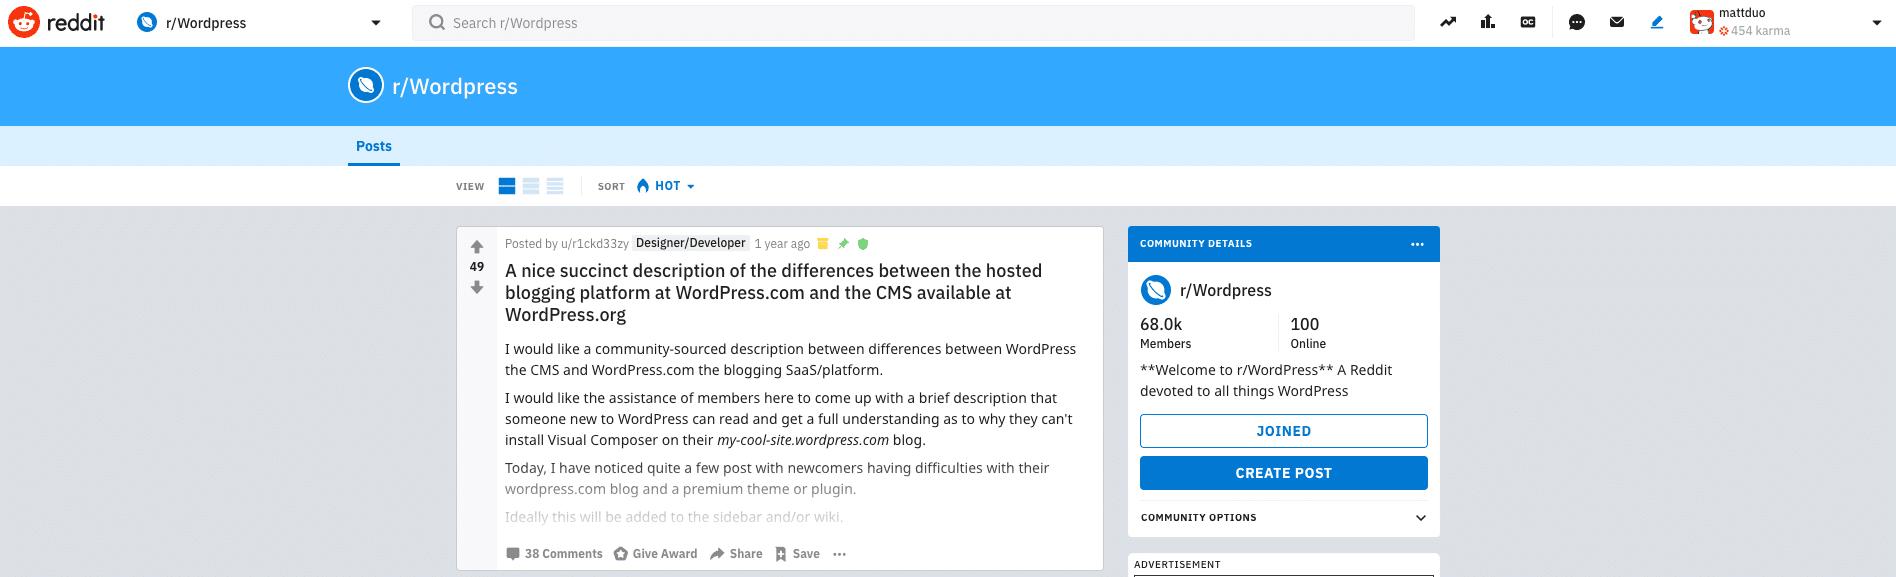 WordPress på Reddit